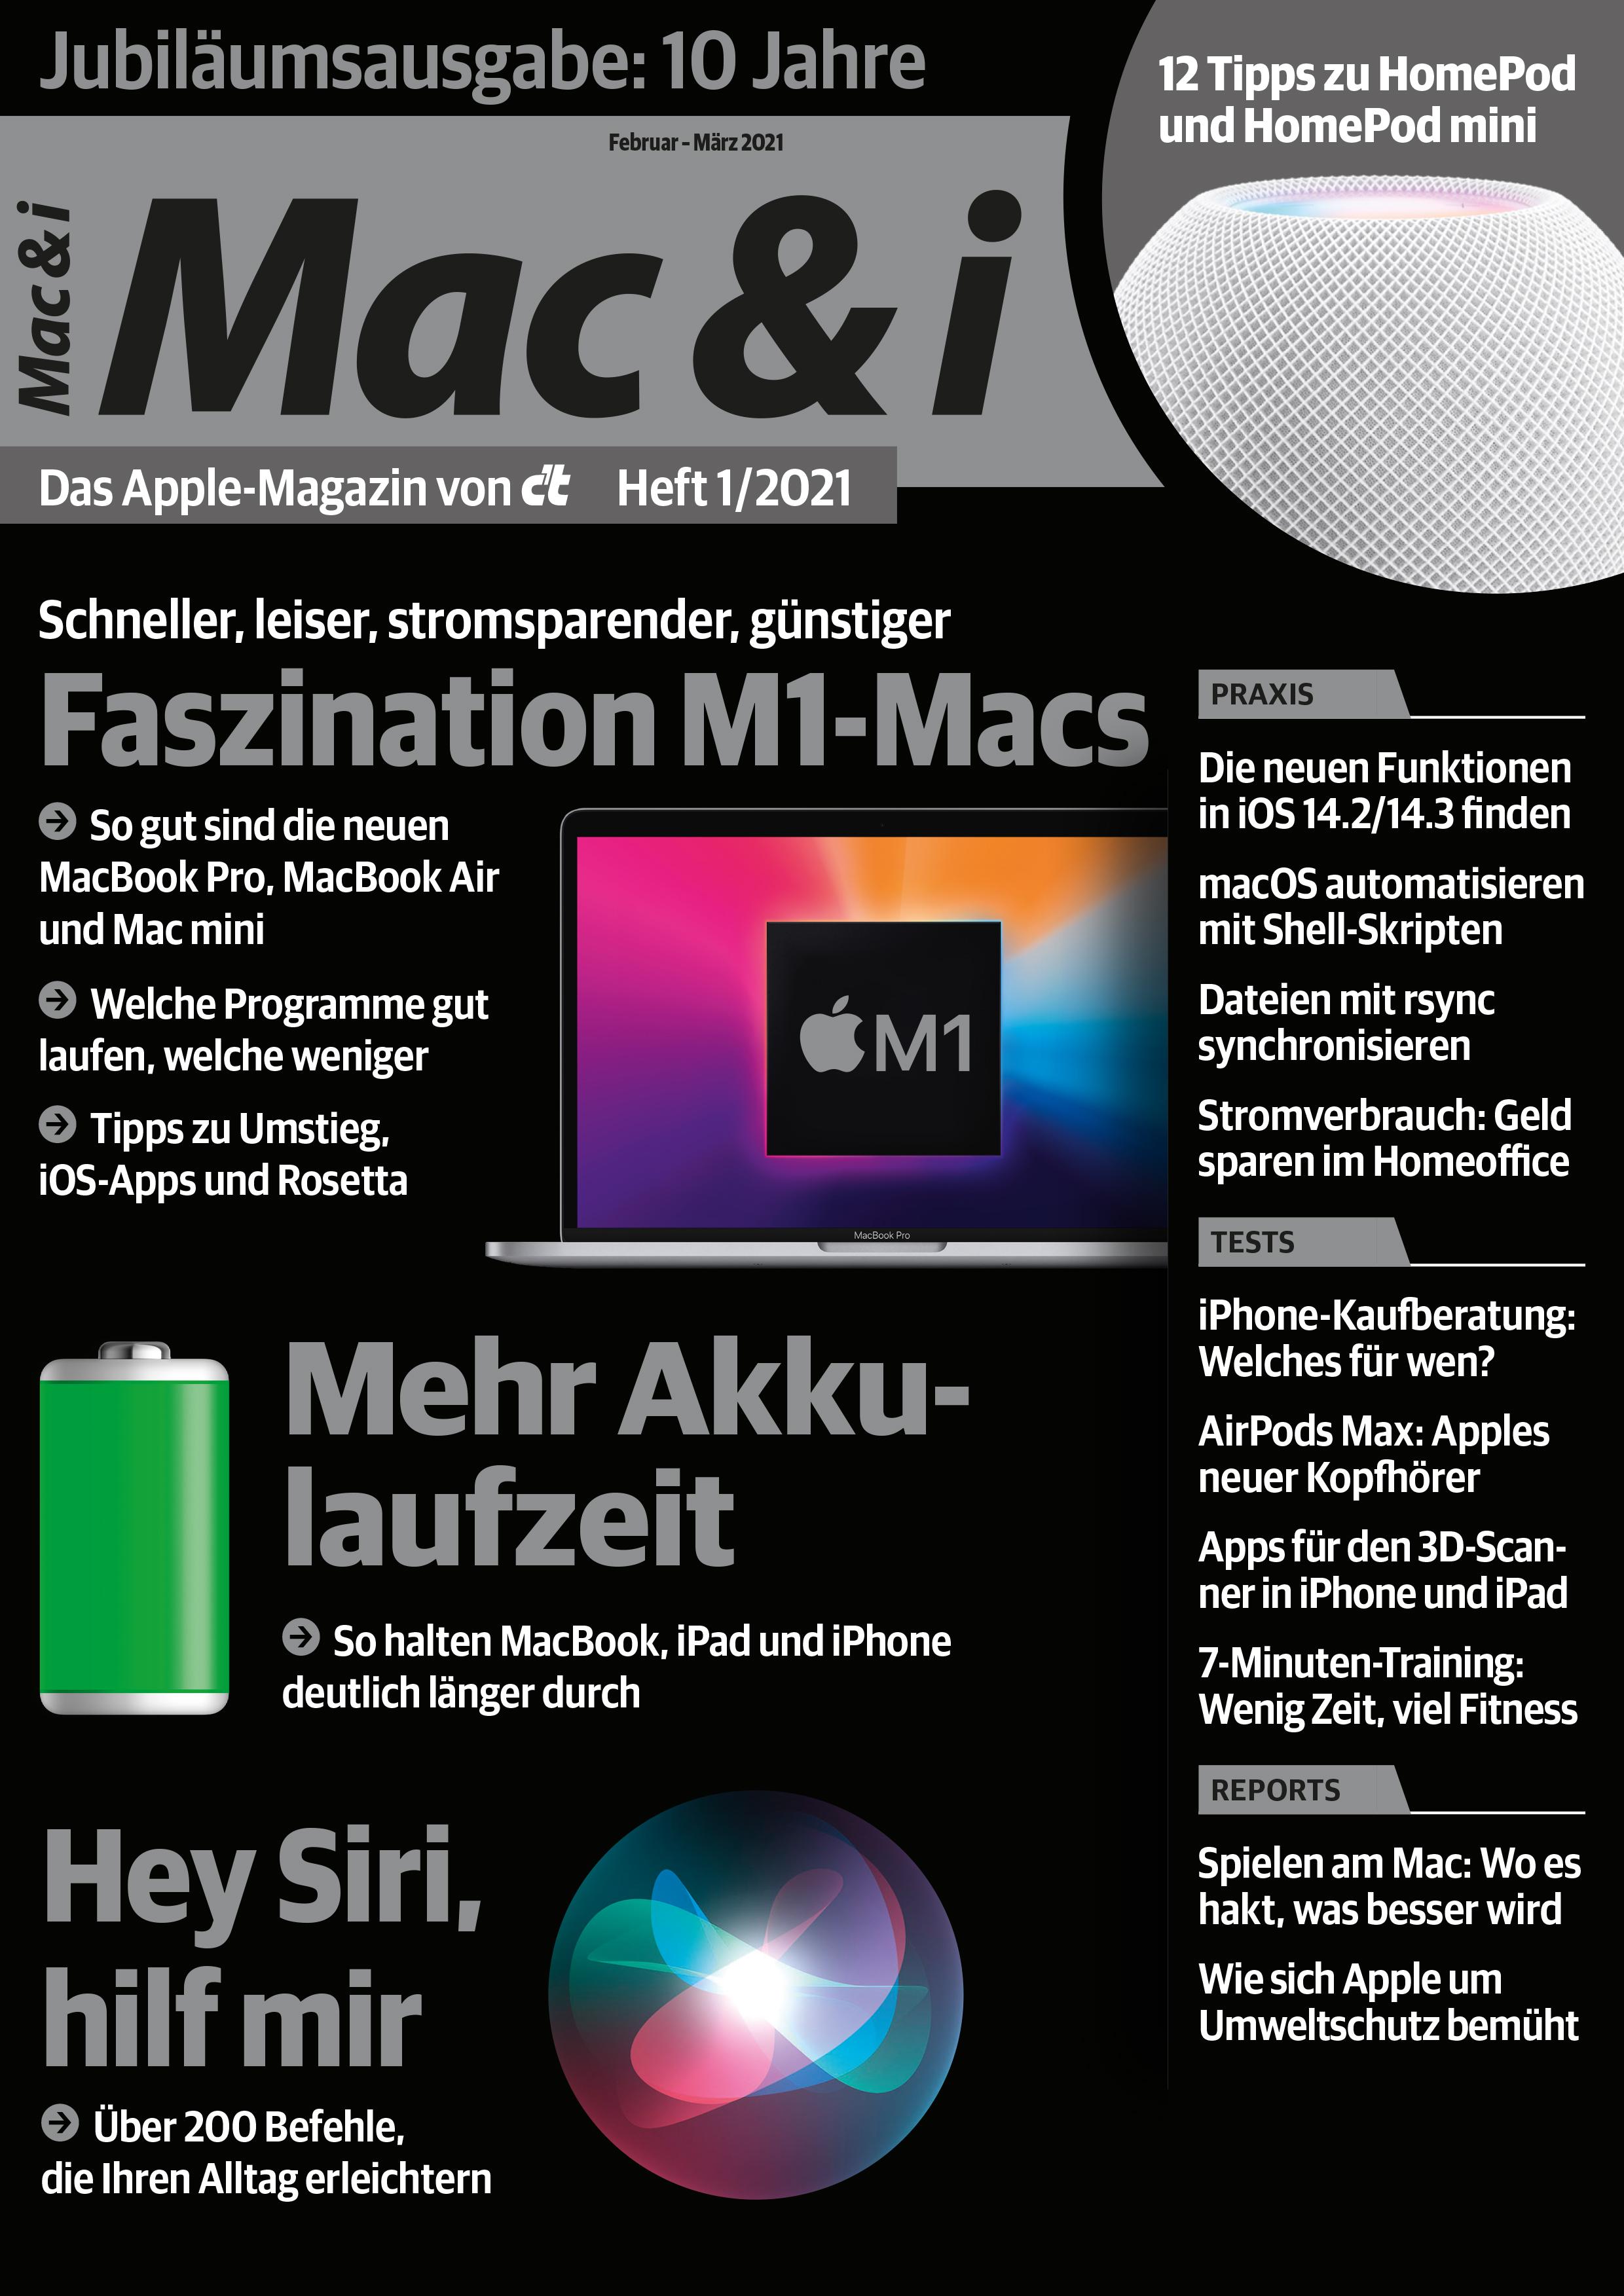 Mac & i 01/2021